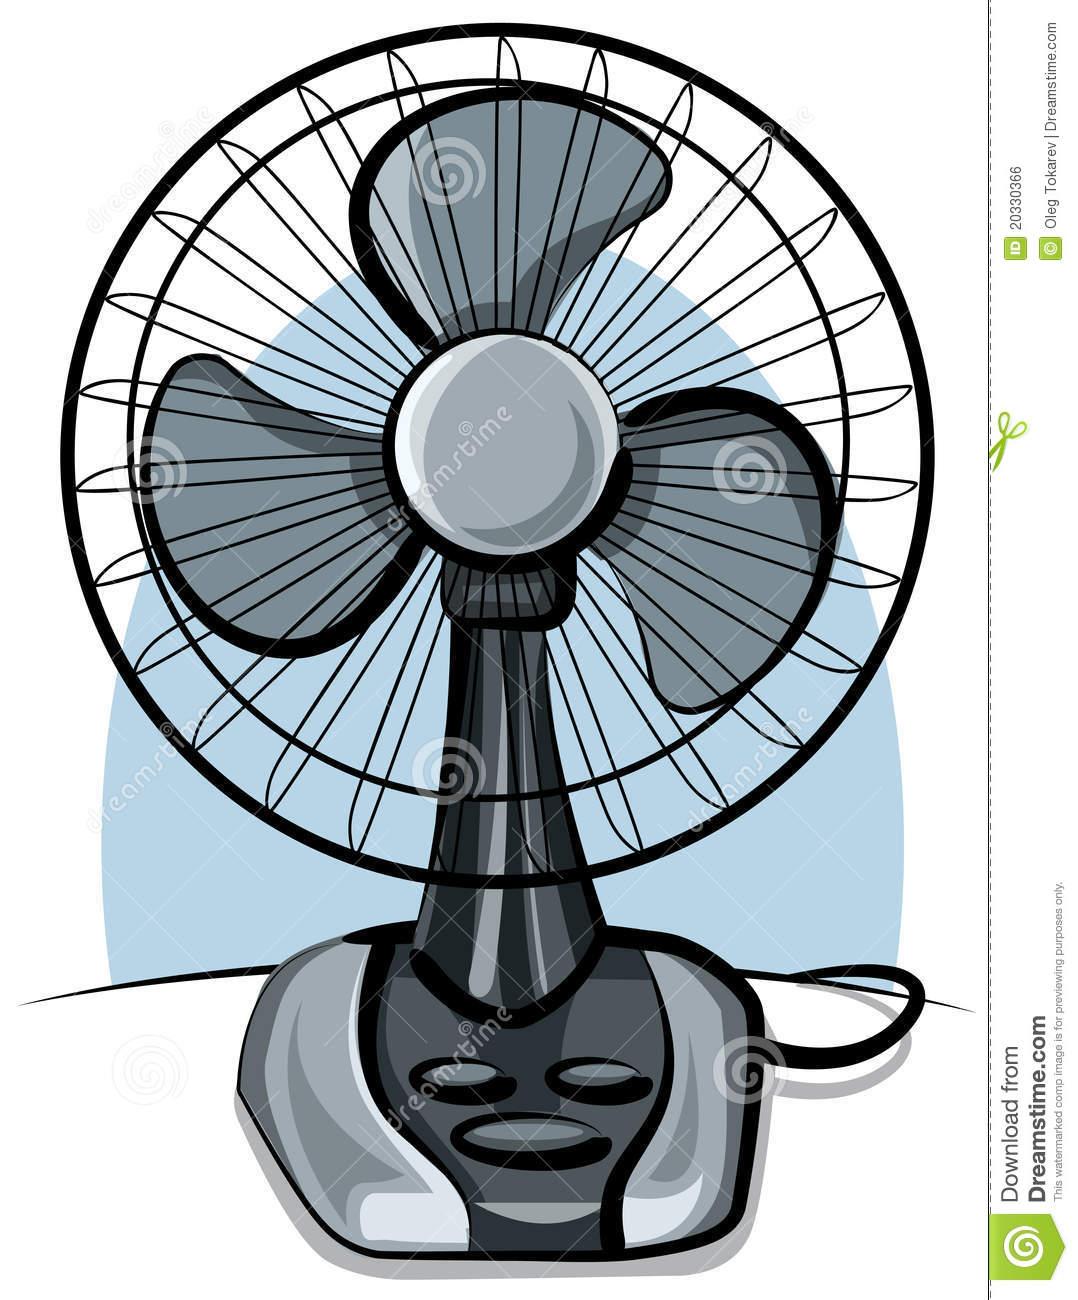 Table Fan Ventilator Royalty Free Stock Image.